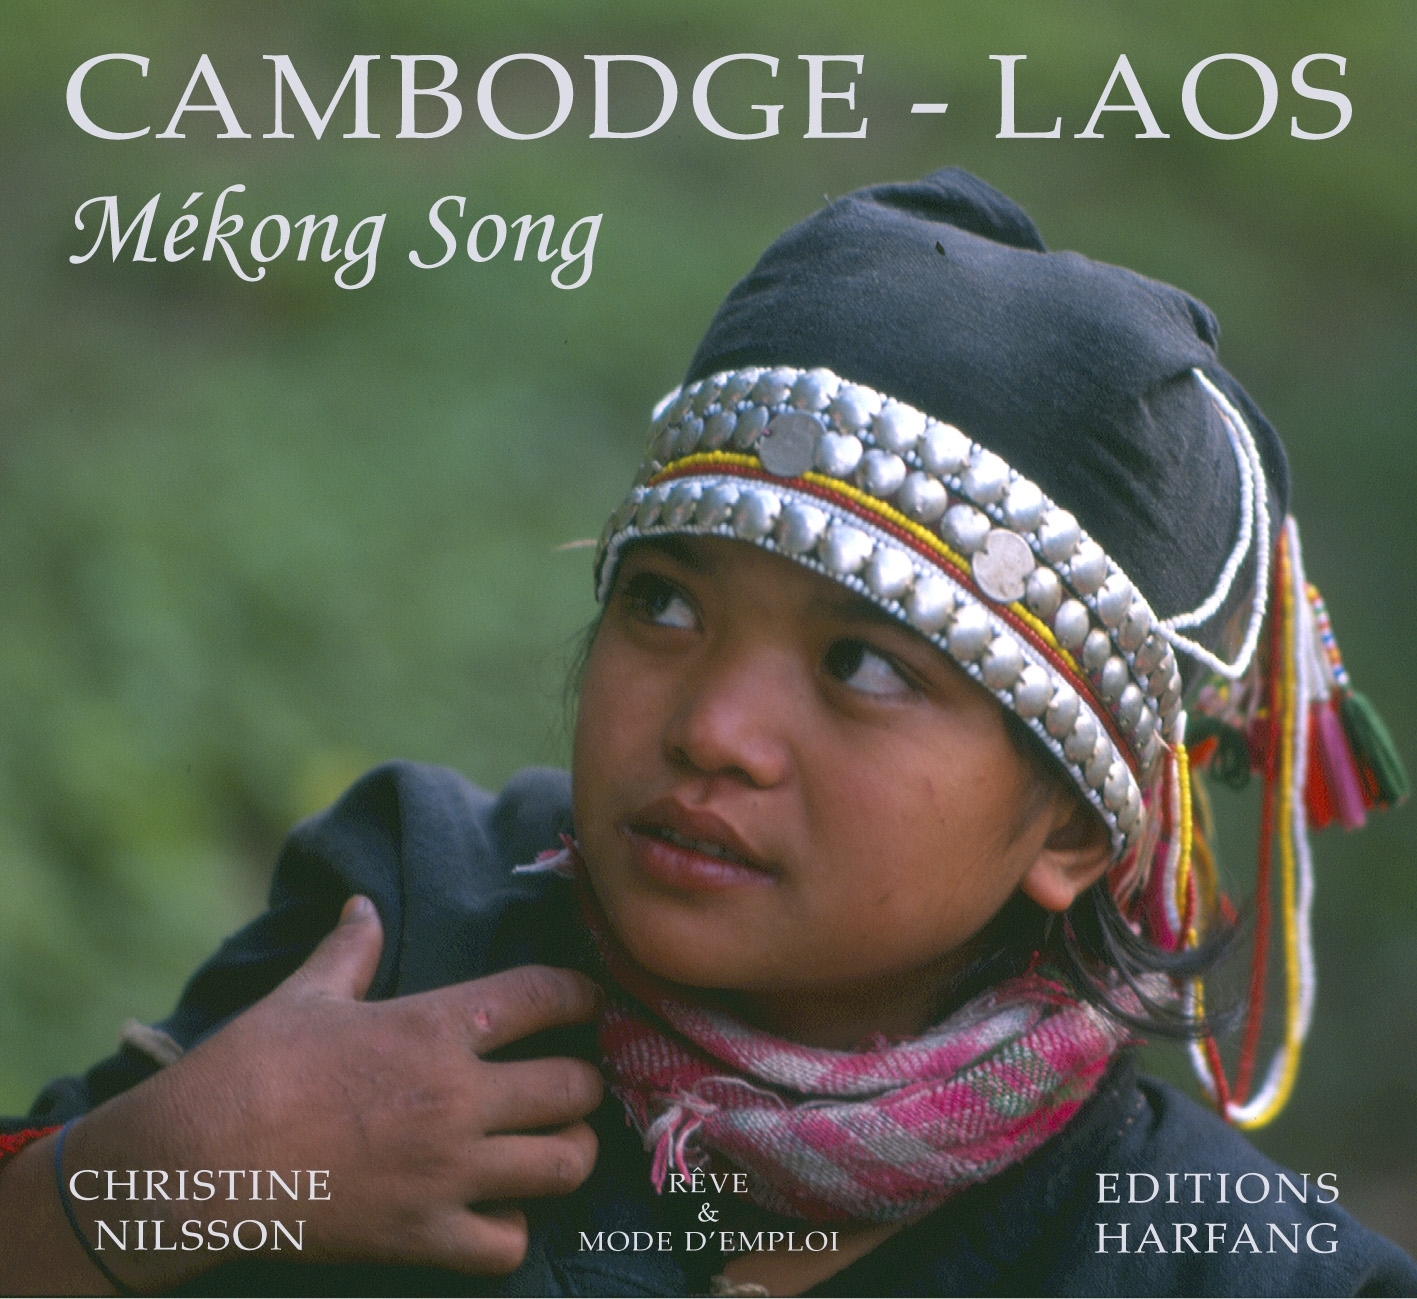 CAMBODGE LAOS MEKONG SONG